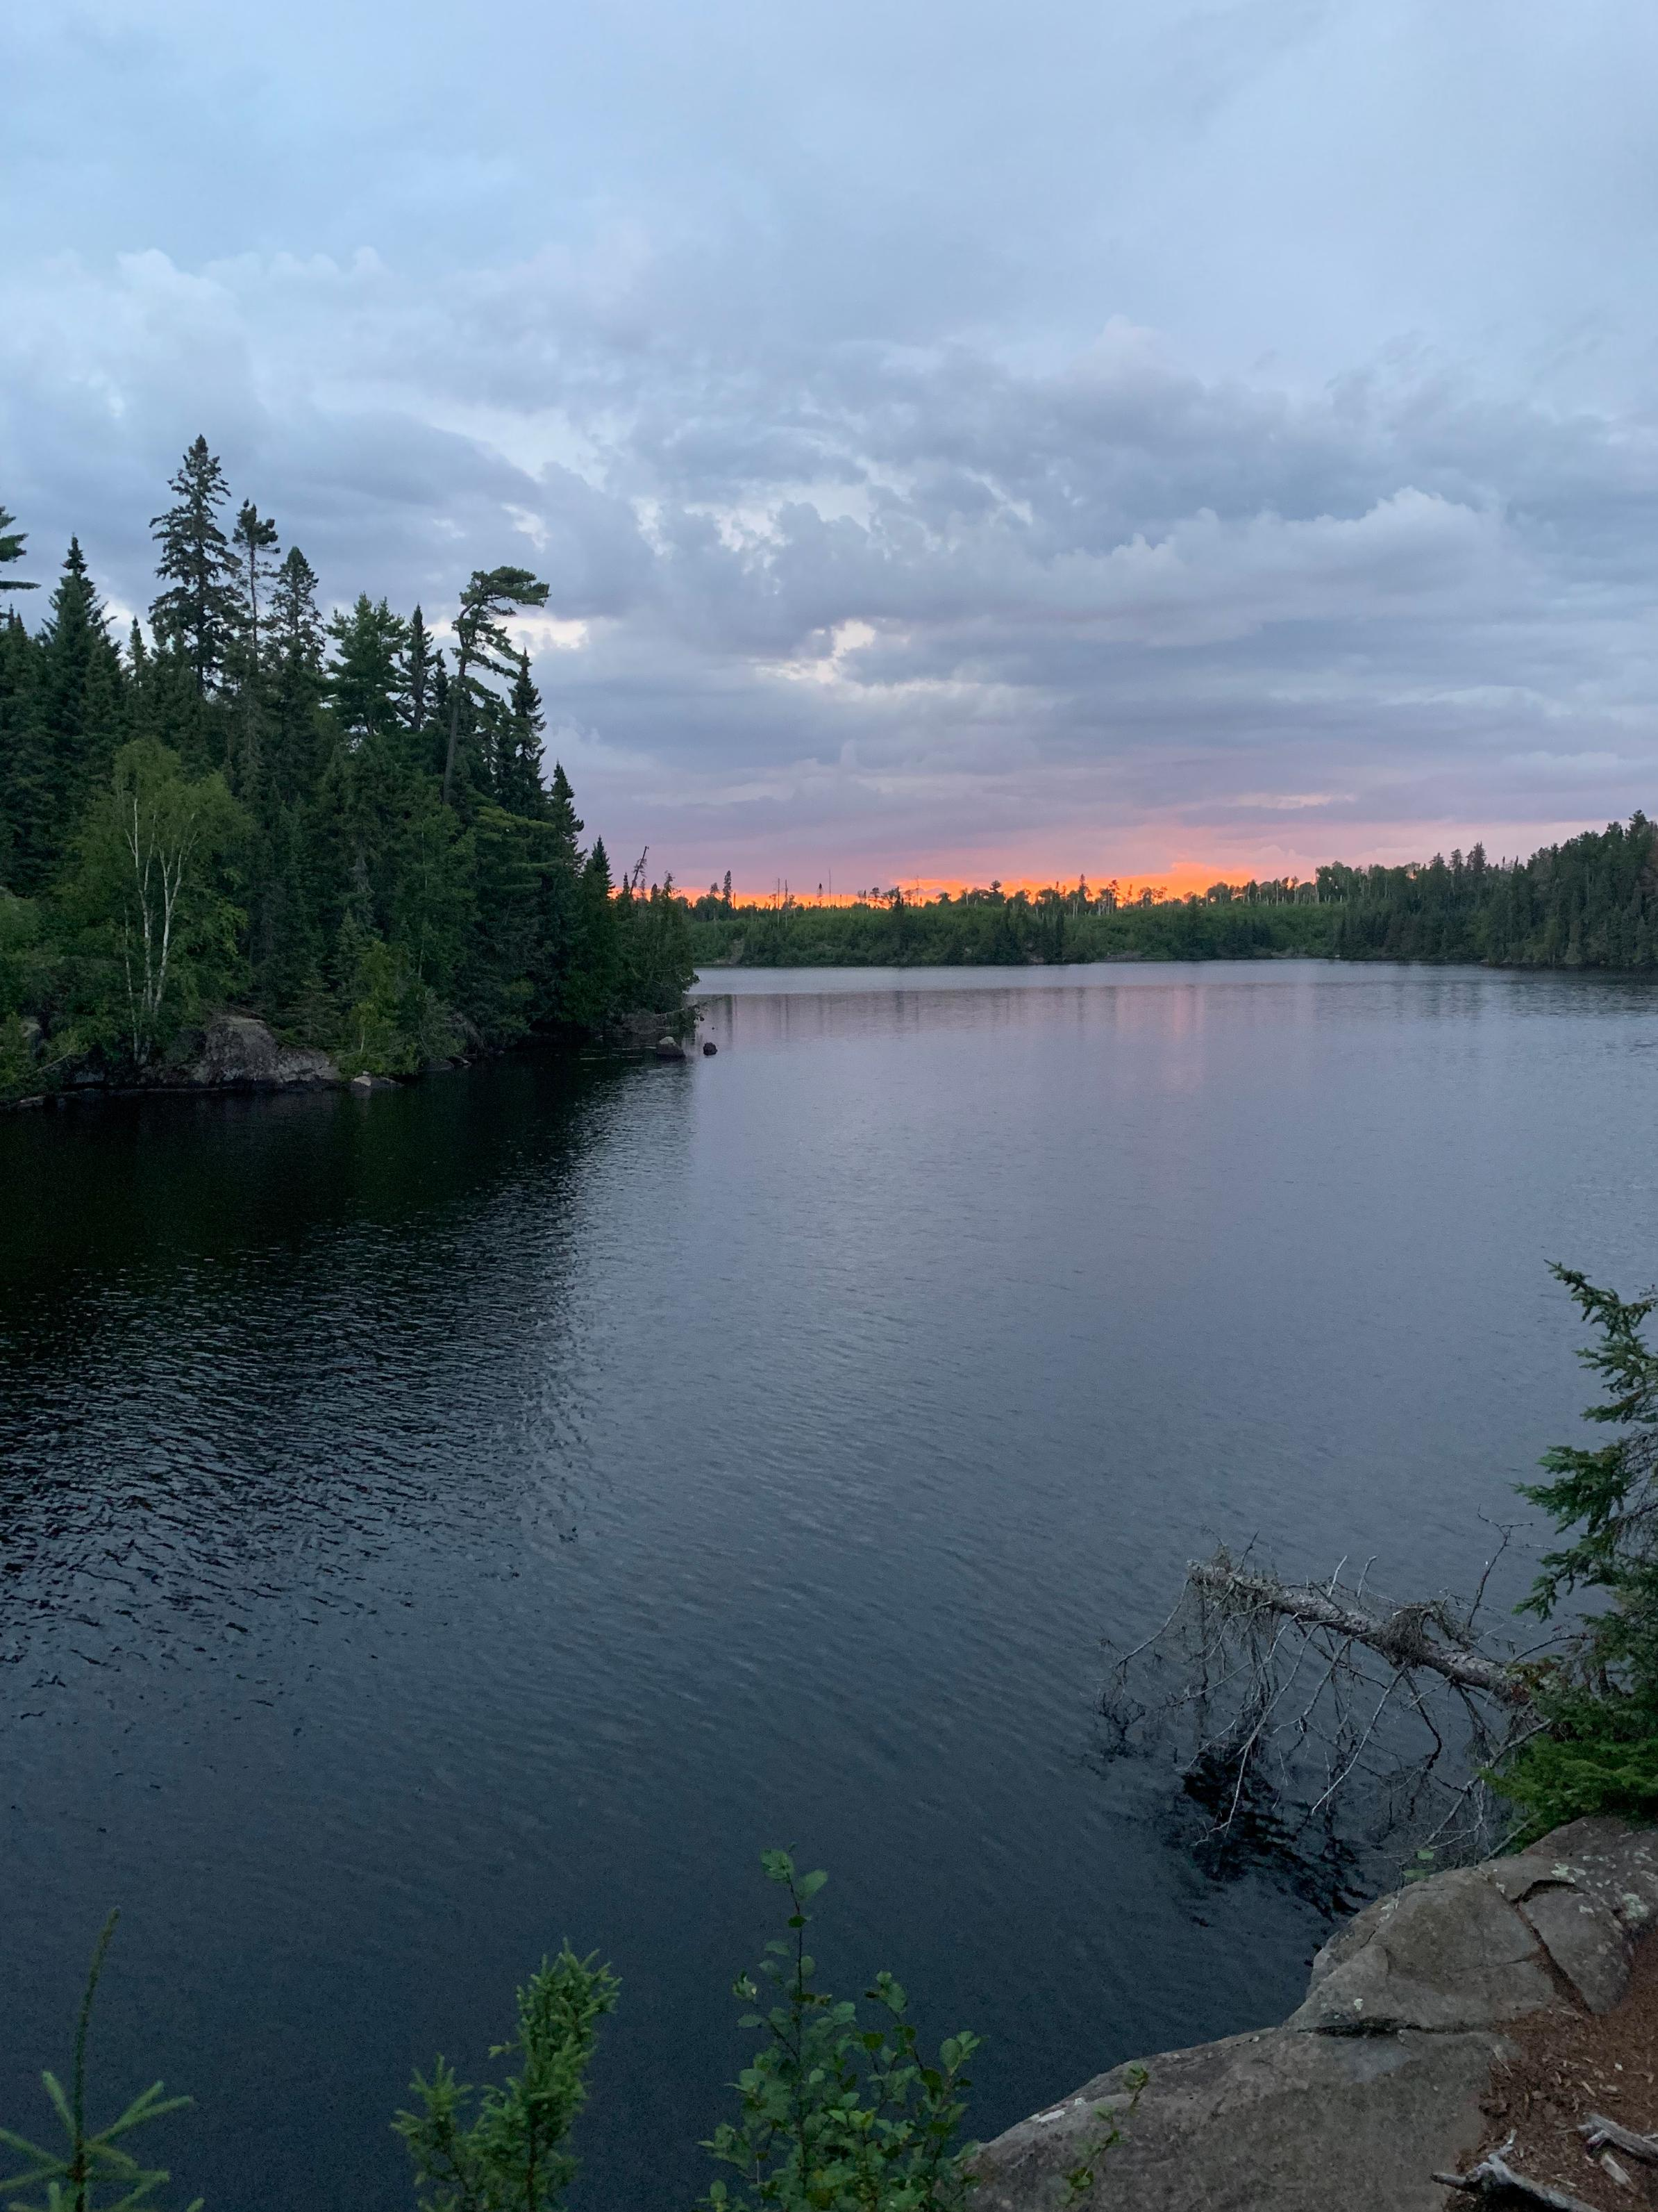 LI sunset